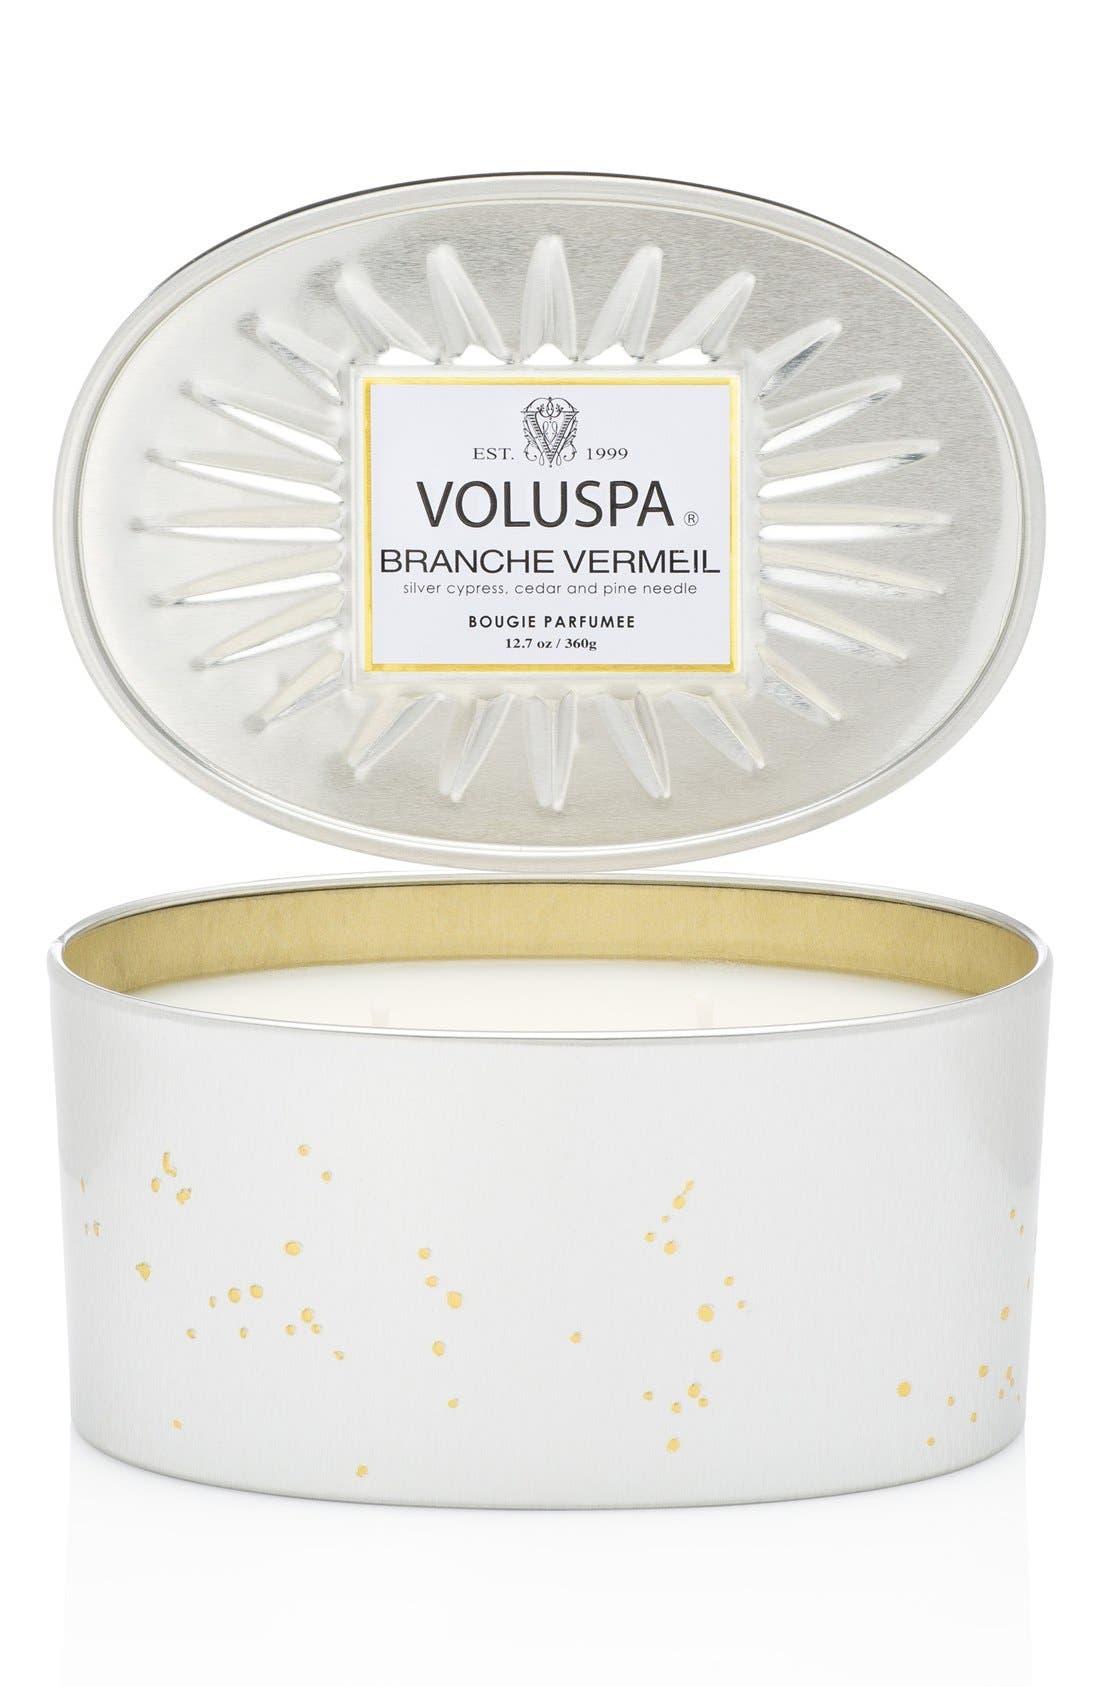 Voluspa 'Vermeil - Branche Vermeil' Two-Wick Candle